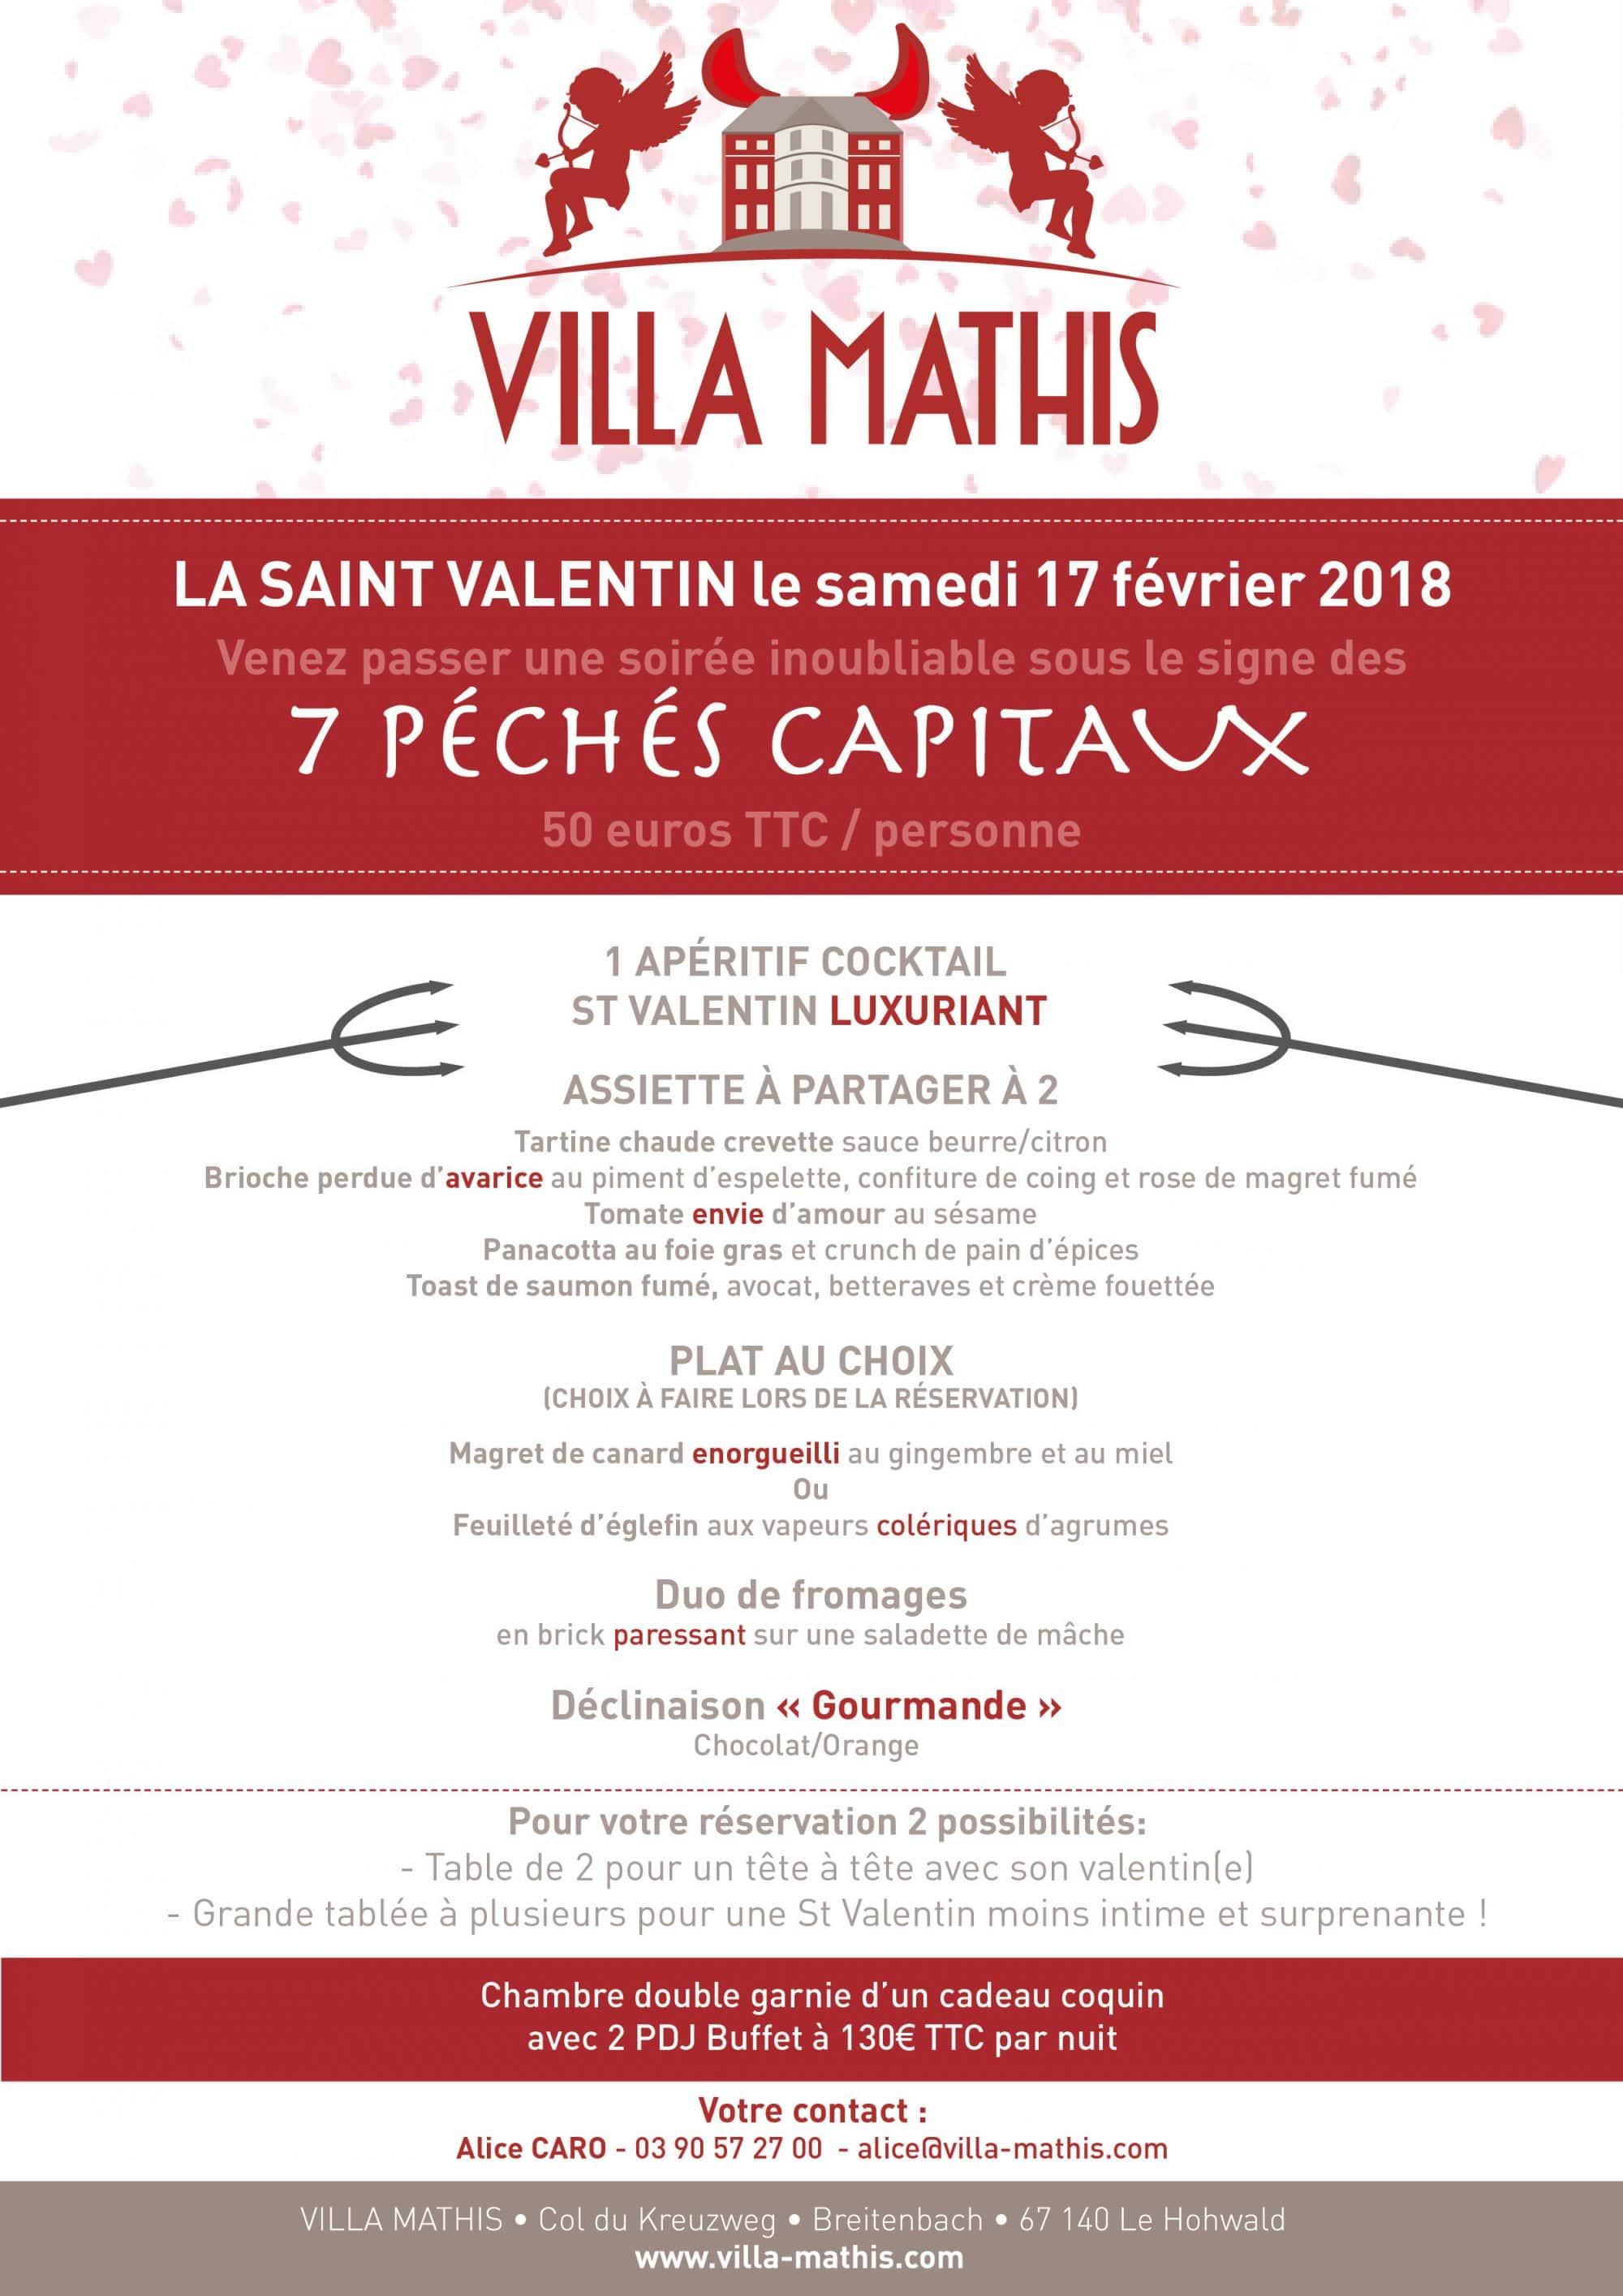 La Villa Mathis Alsace